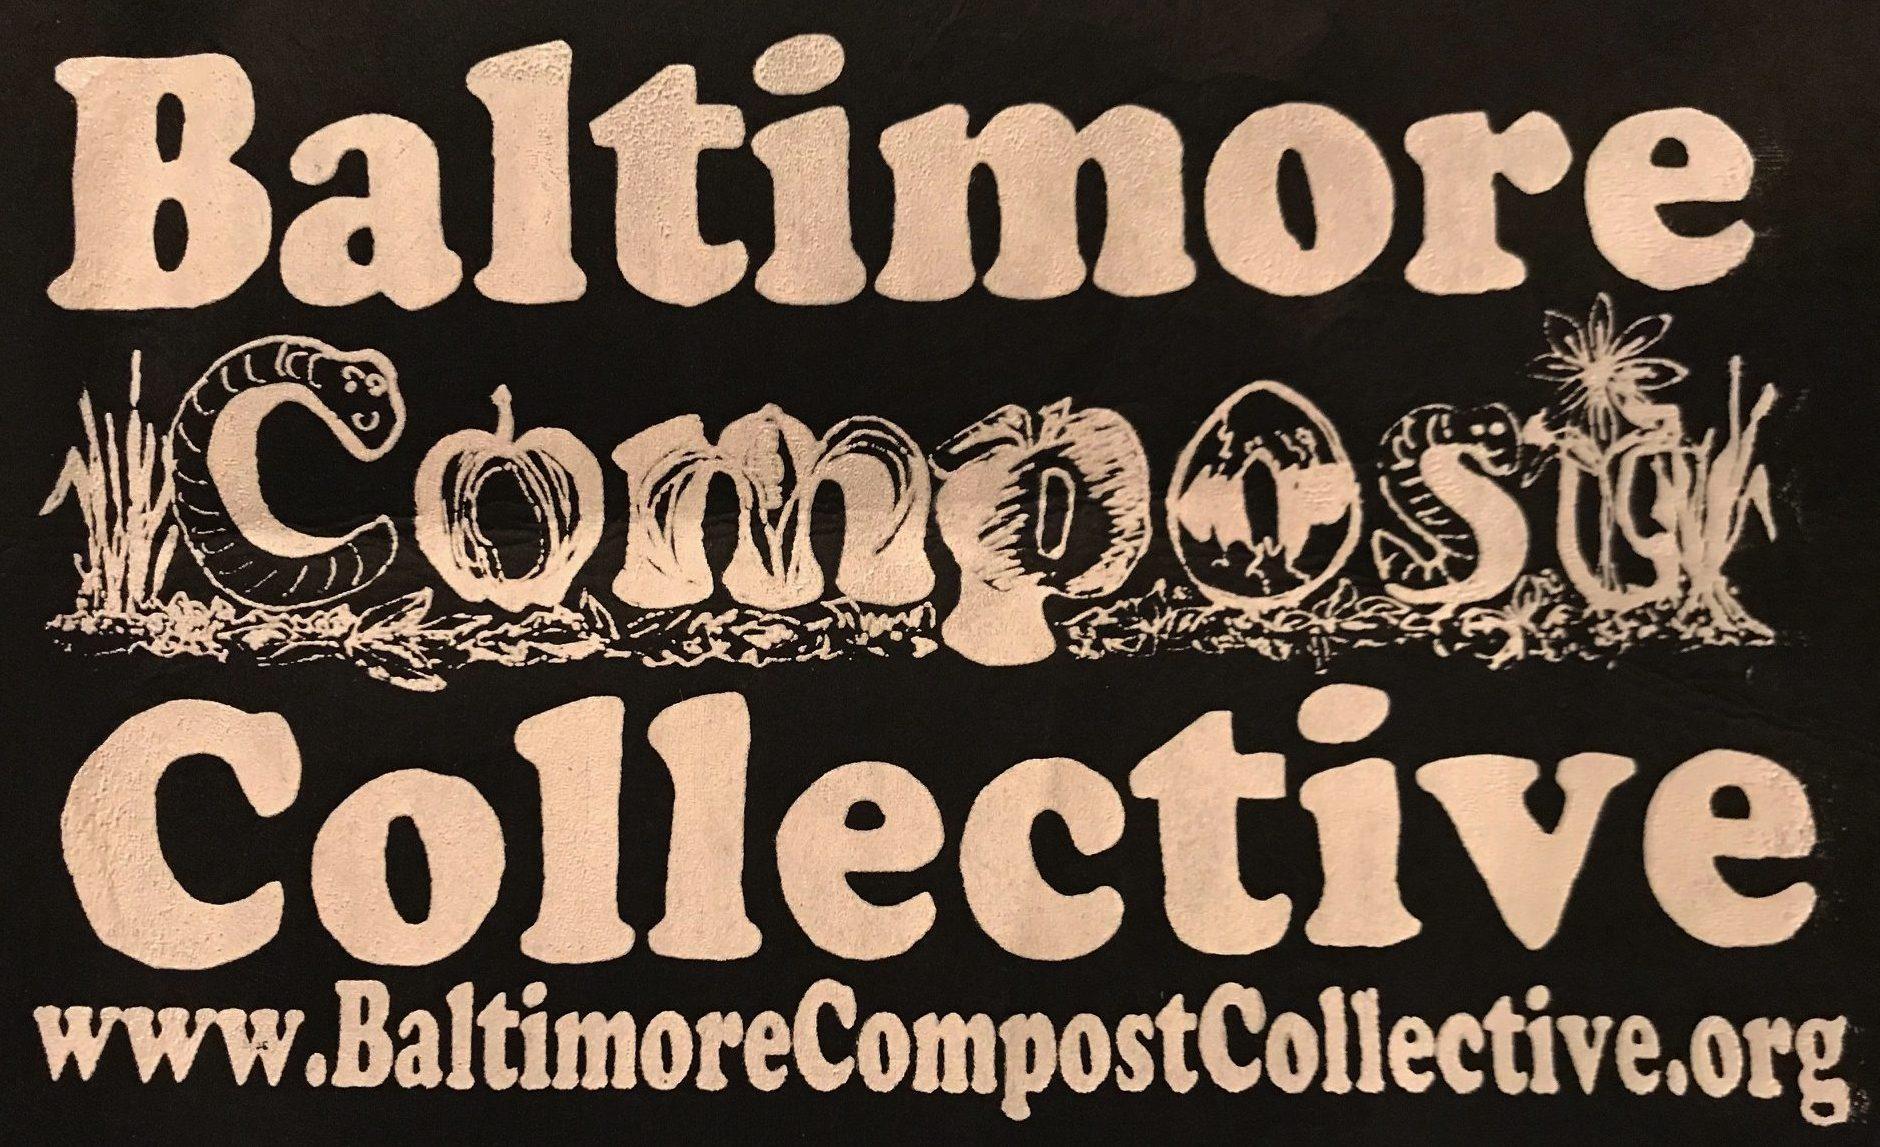 Baltimore Compost Collective